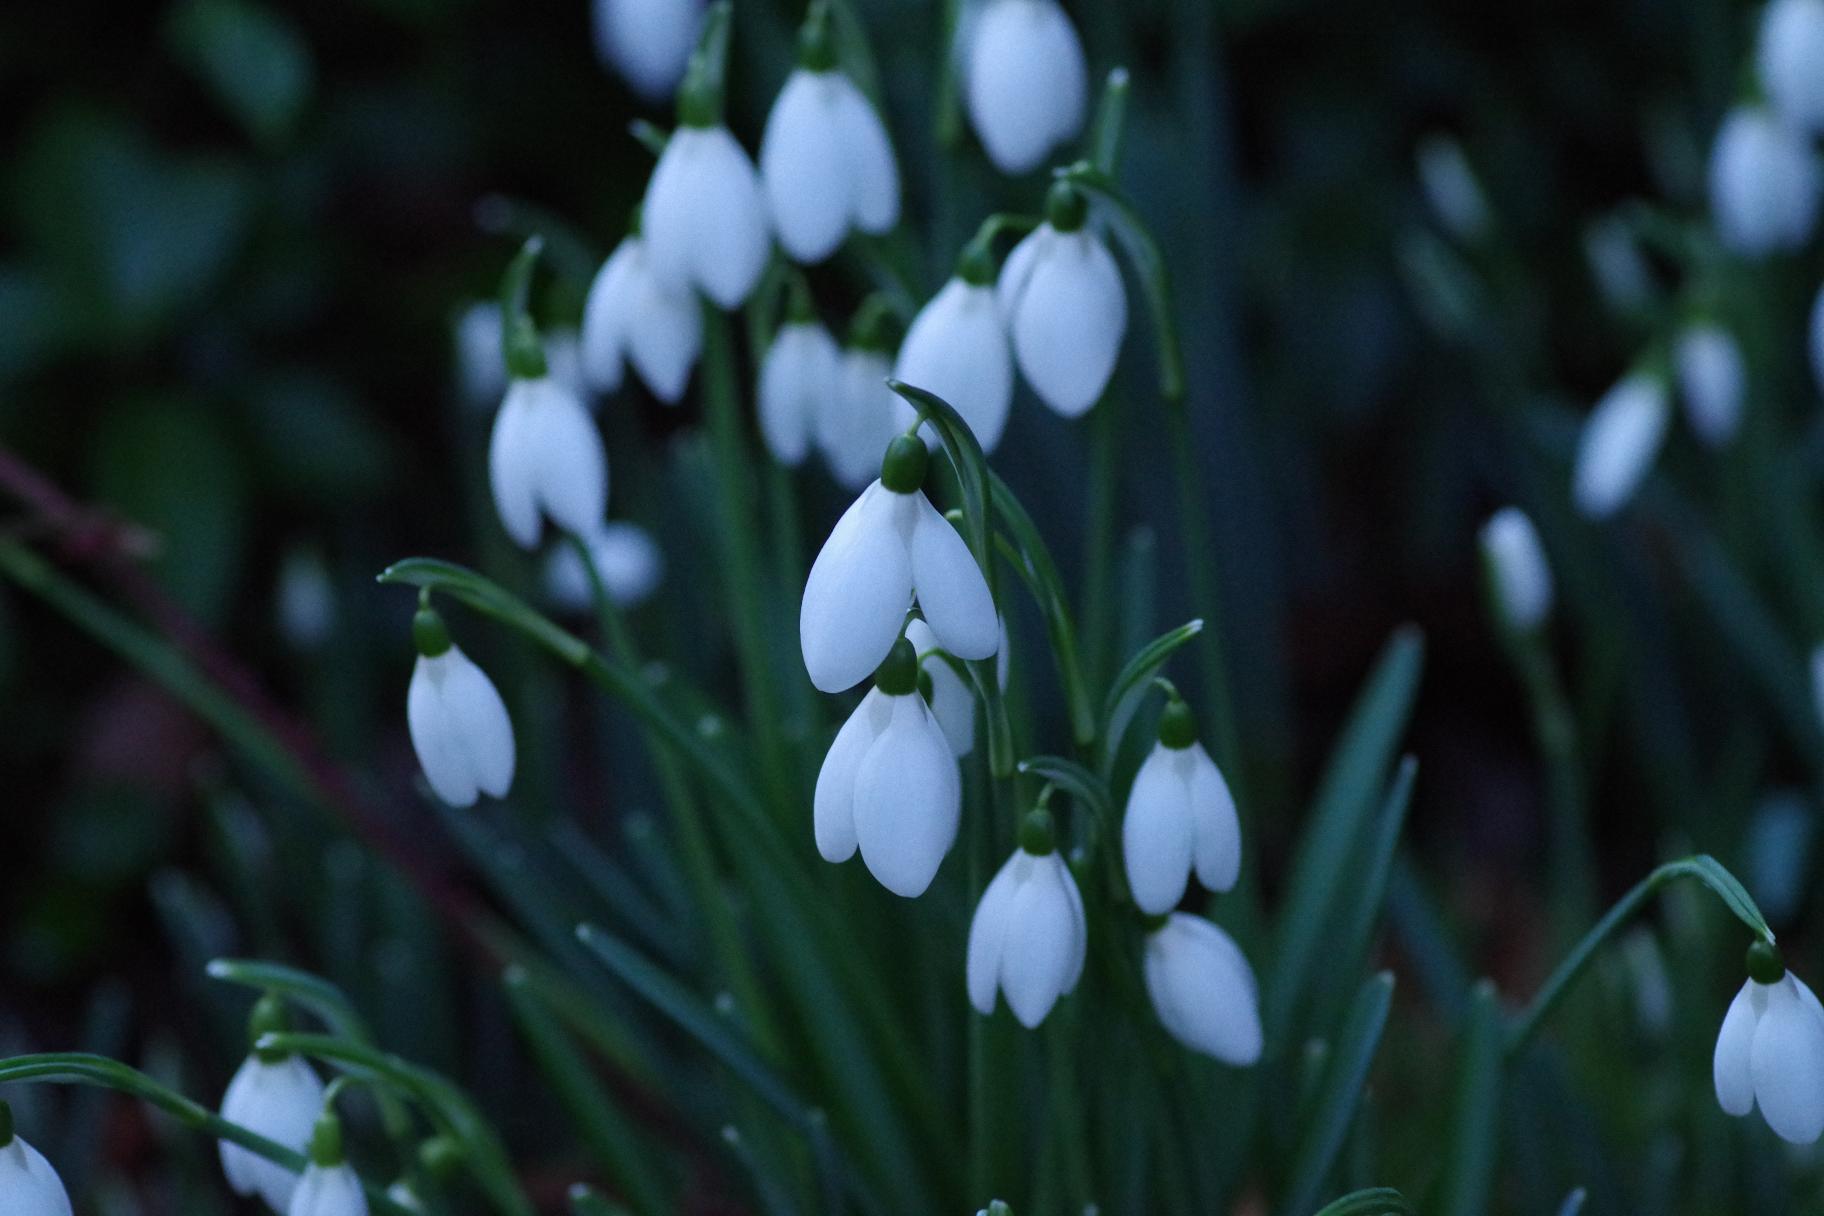 Evening Snowdrops